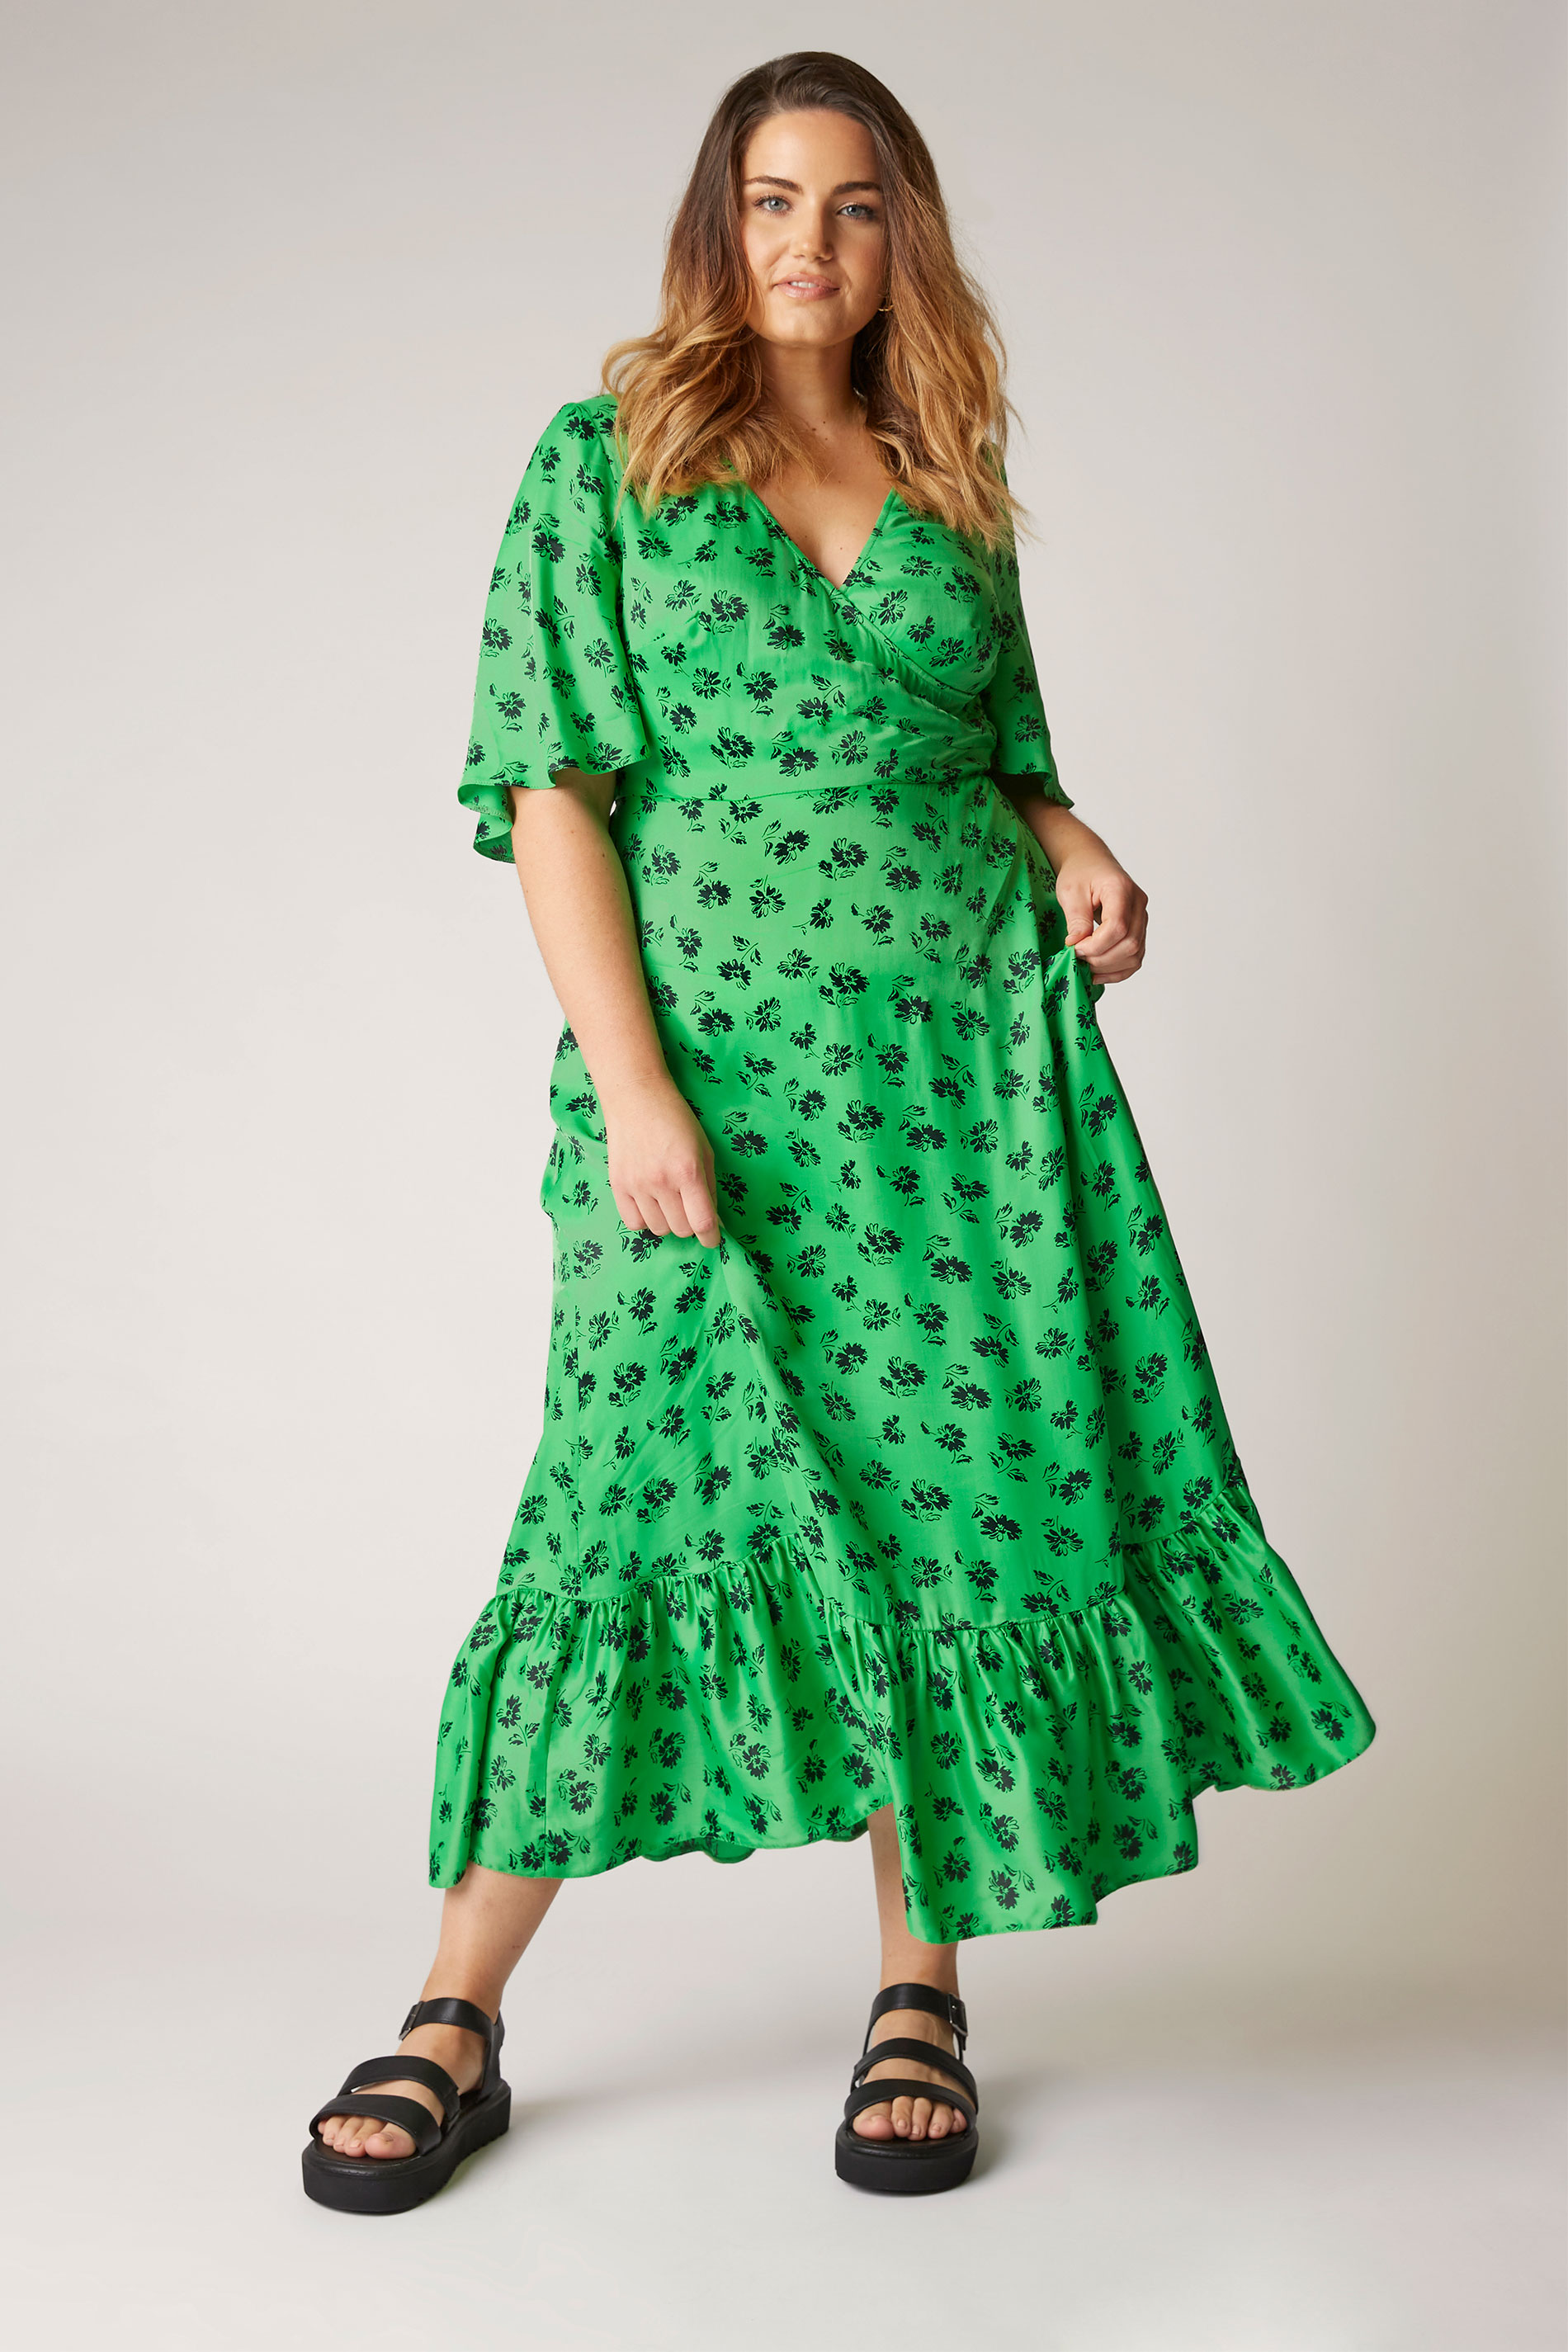 THE LIMITED EDIT Green Floral Ruffled Wrap Maxi Dress_A.jpg